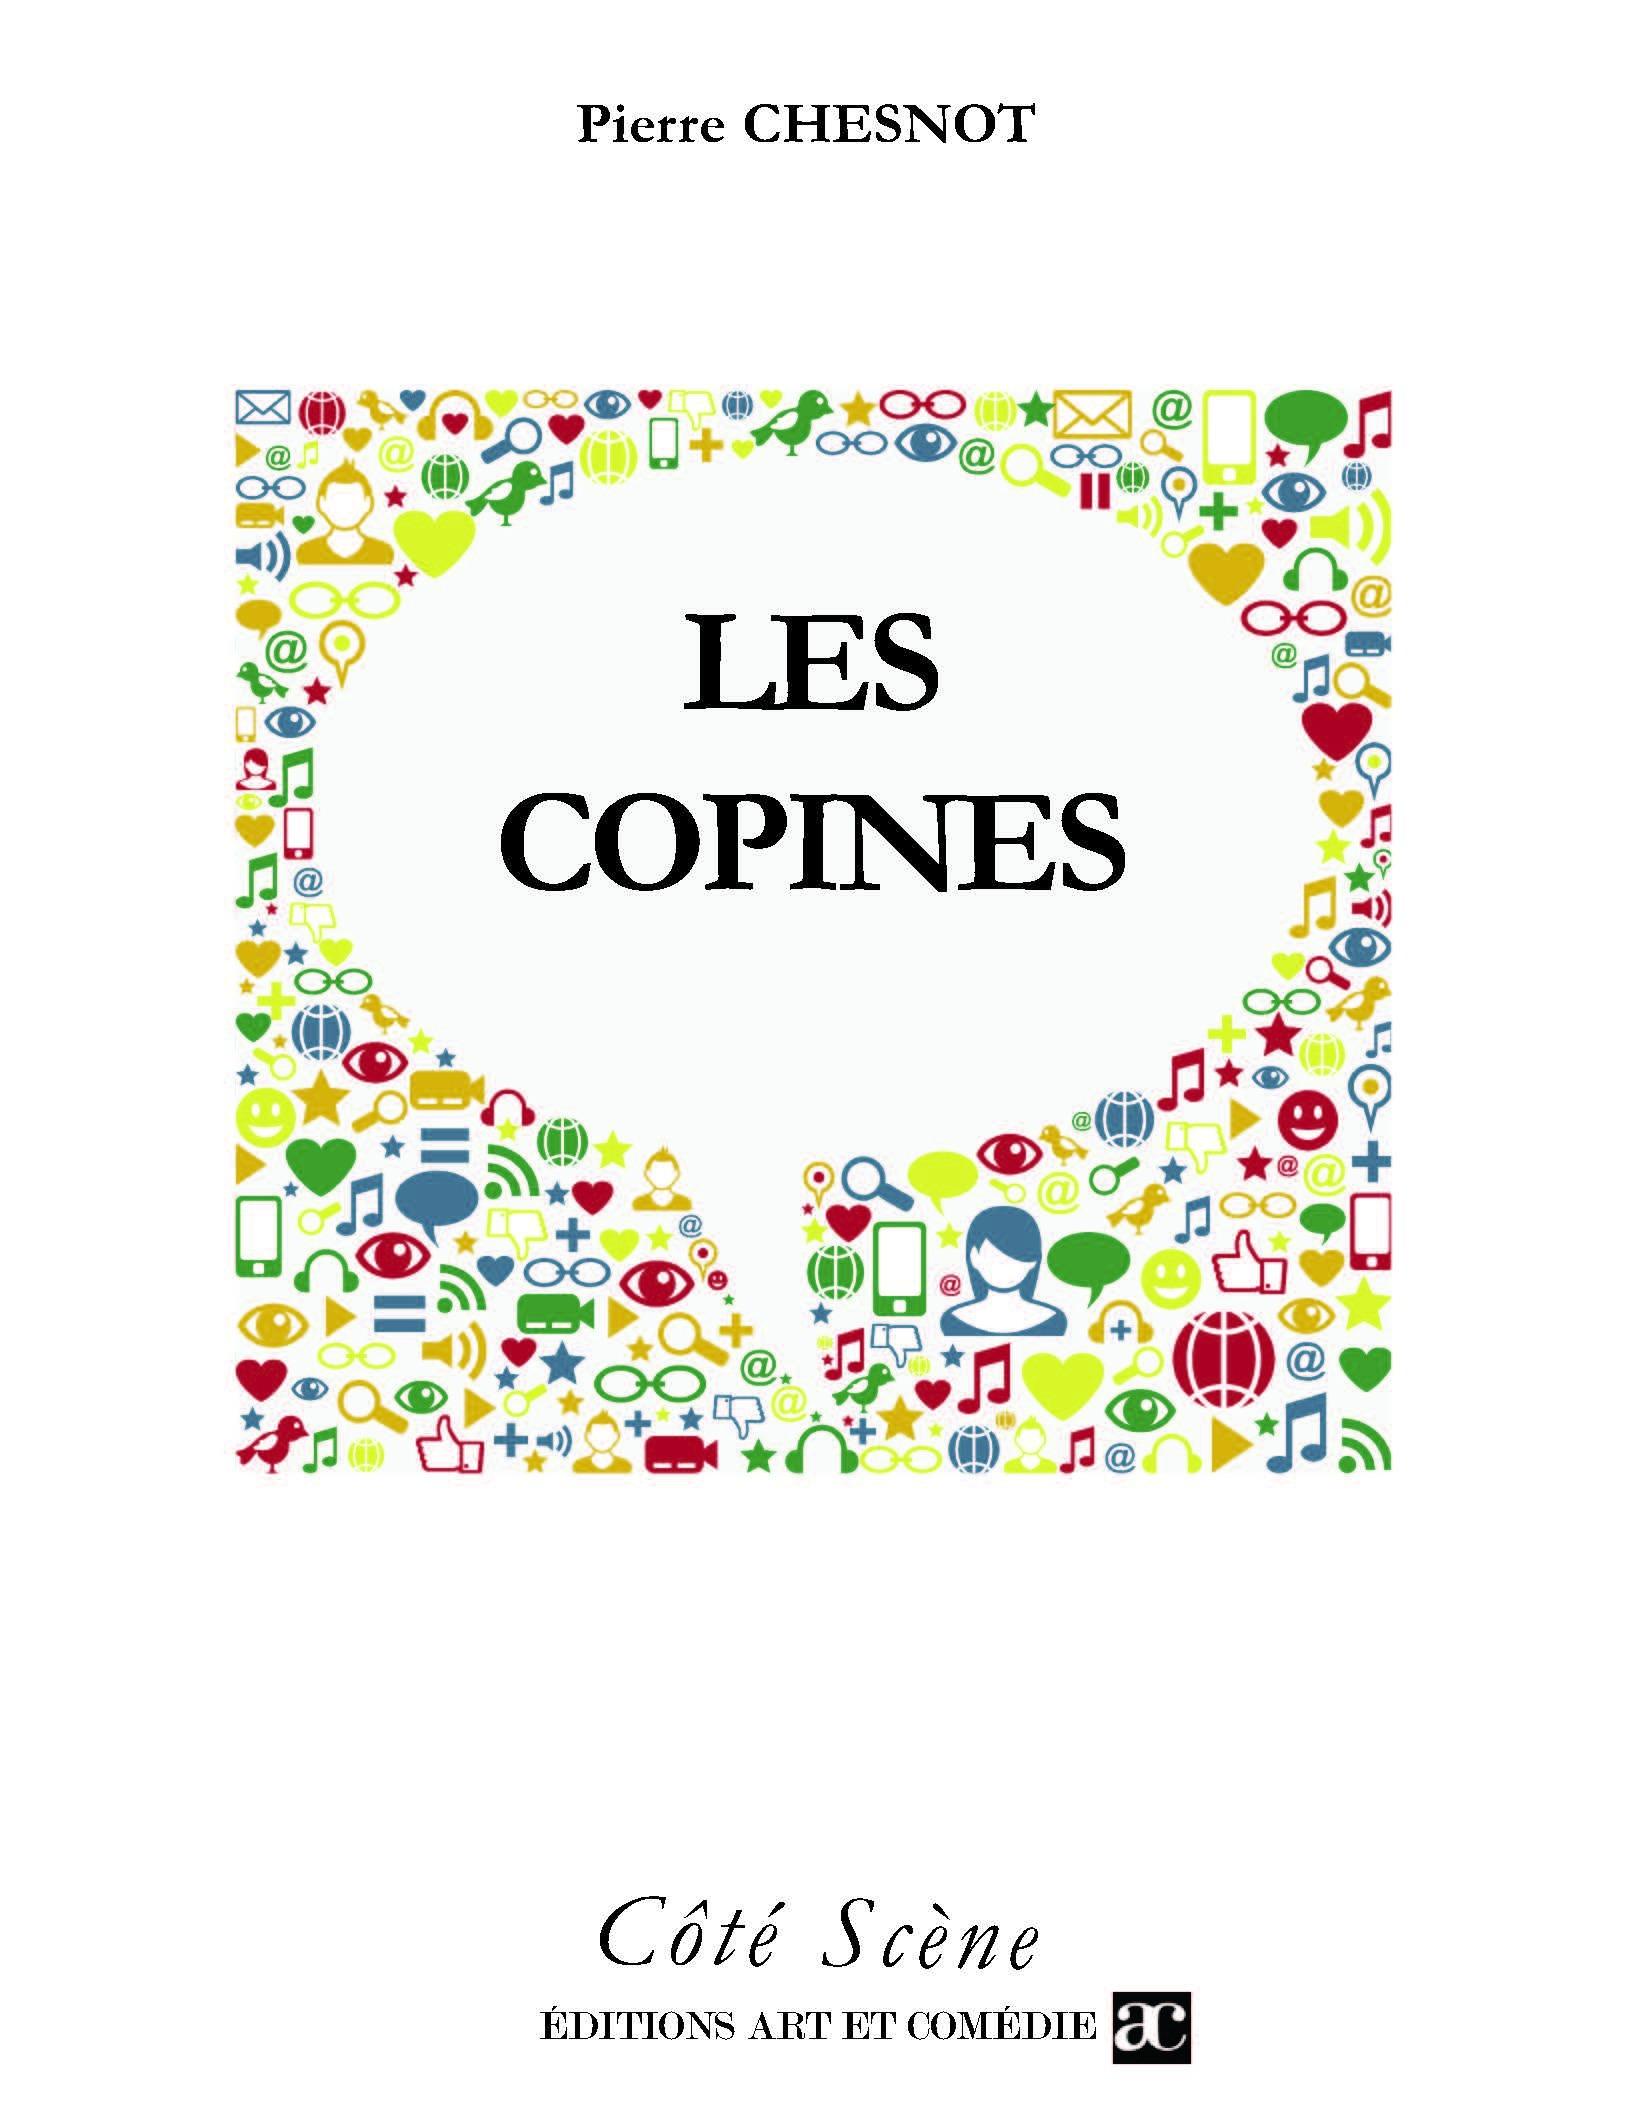 Copines